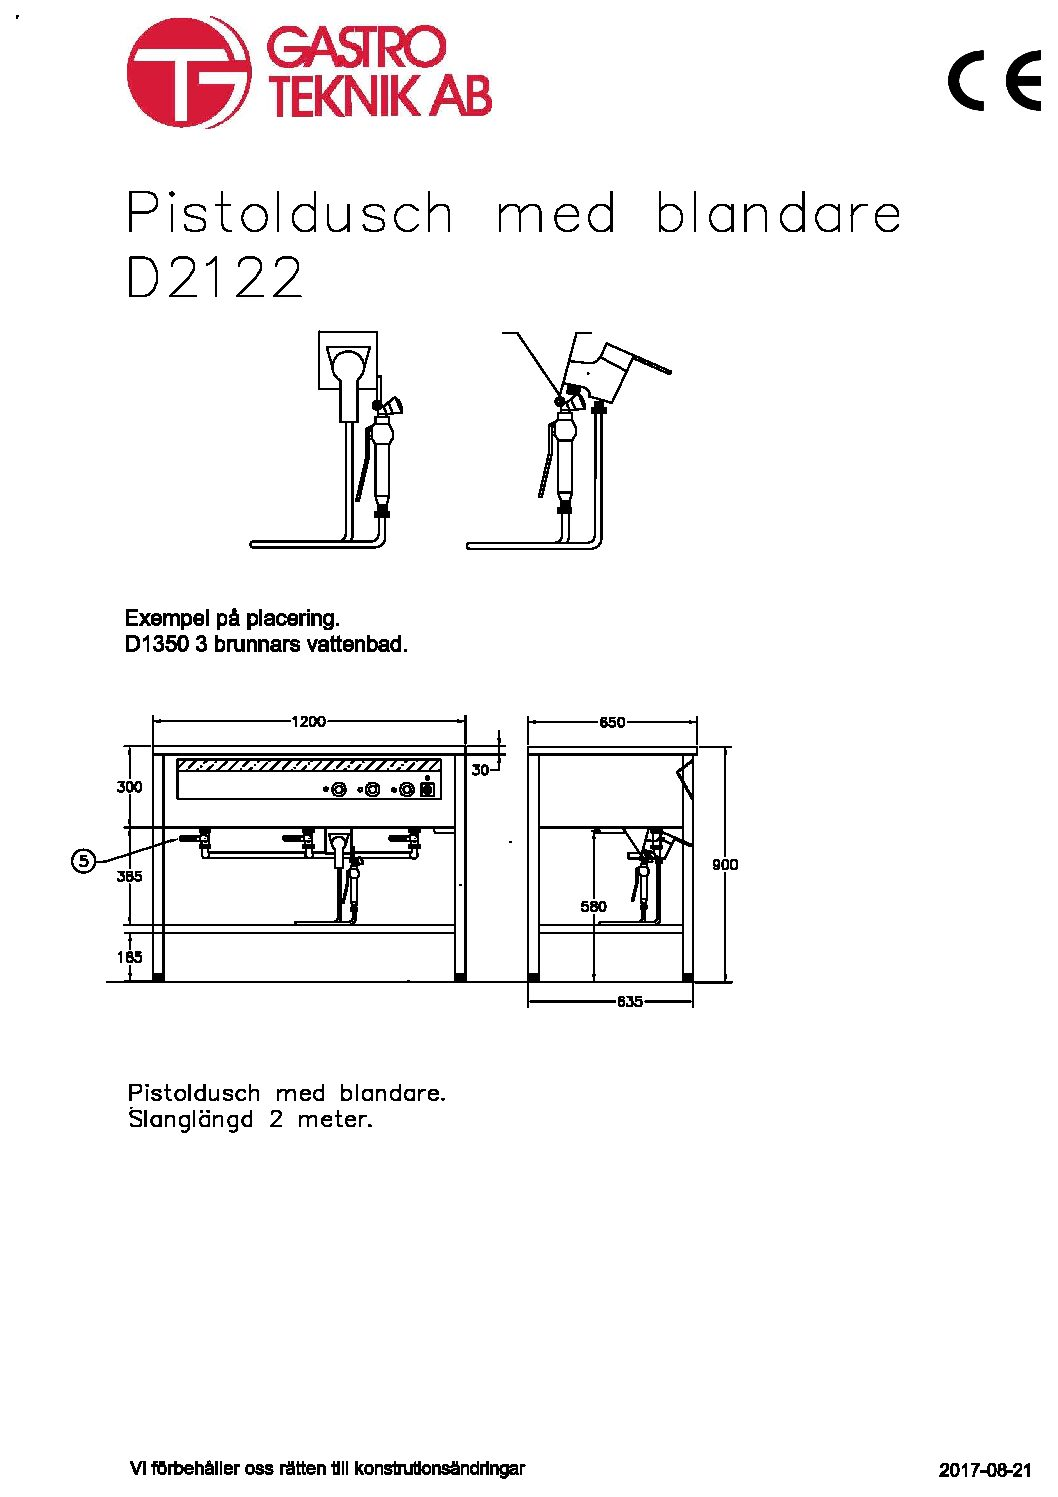 D2122